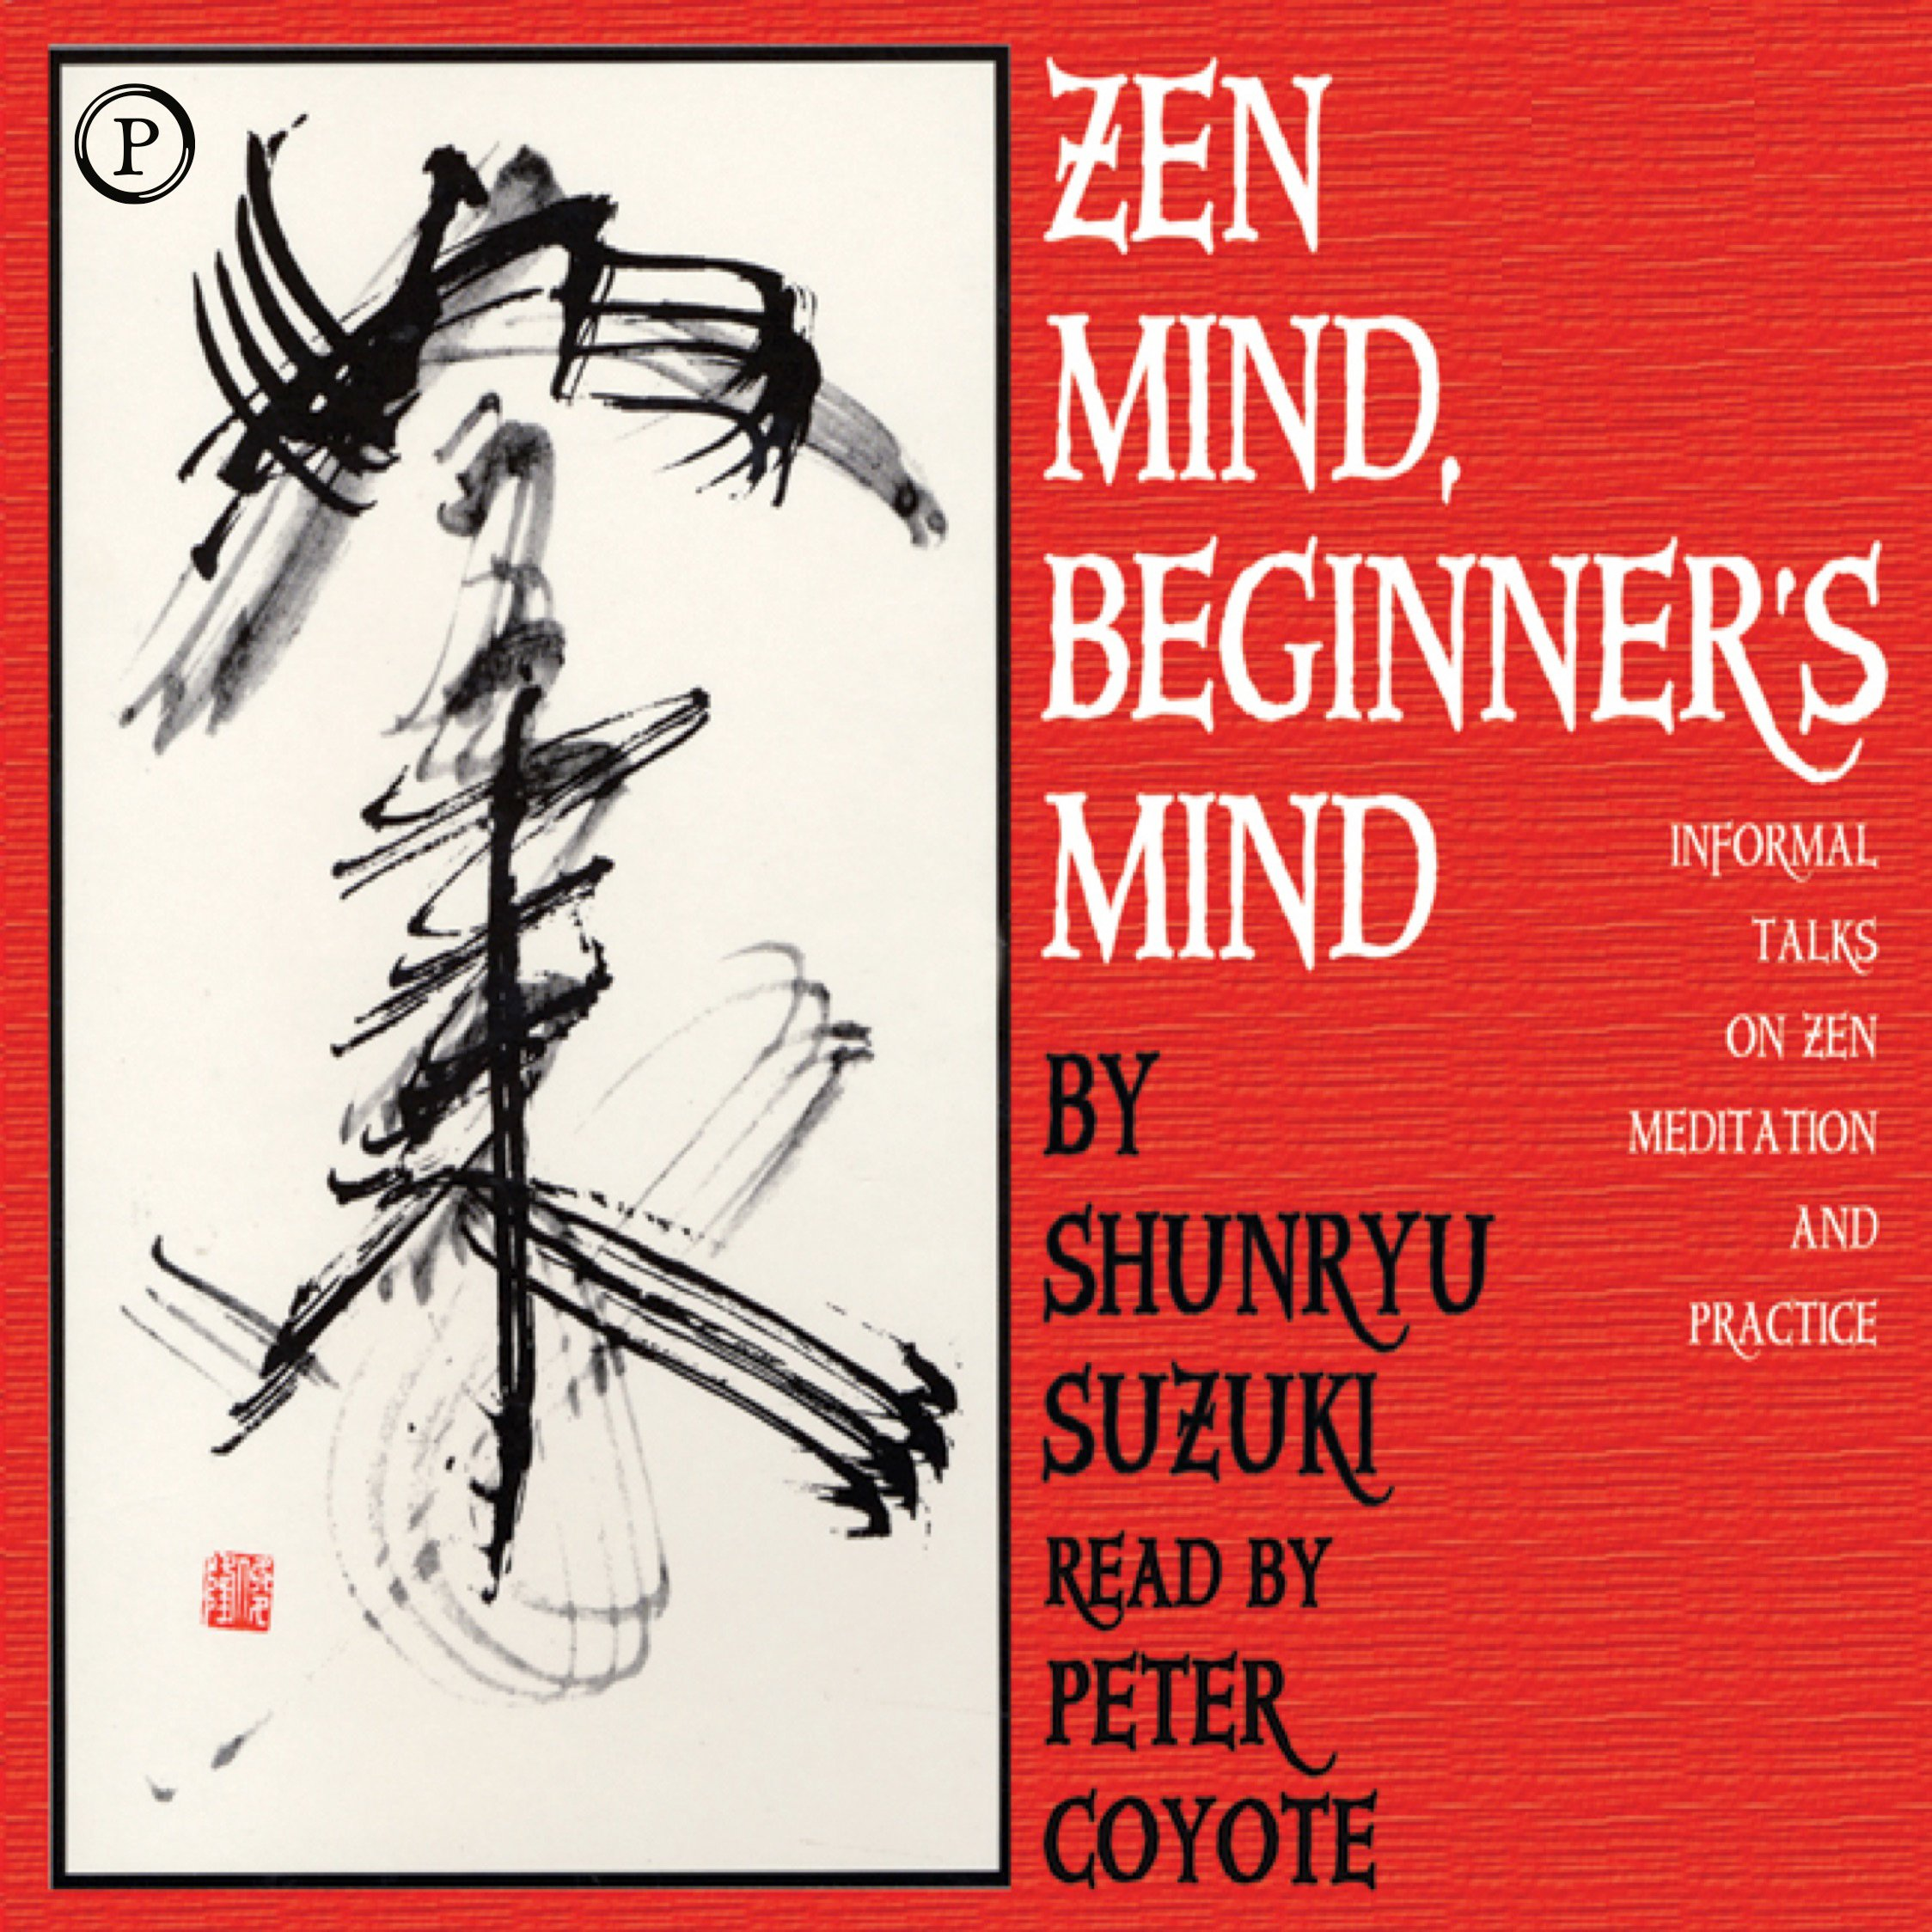 Zen Mind Beginner's Mind: Informal Talks on Zen Meditation and Practice